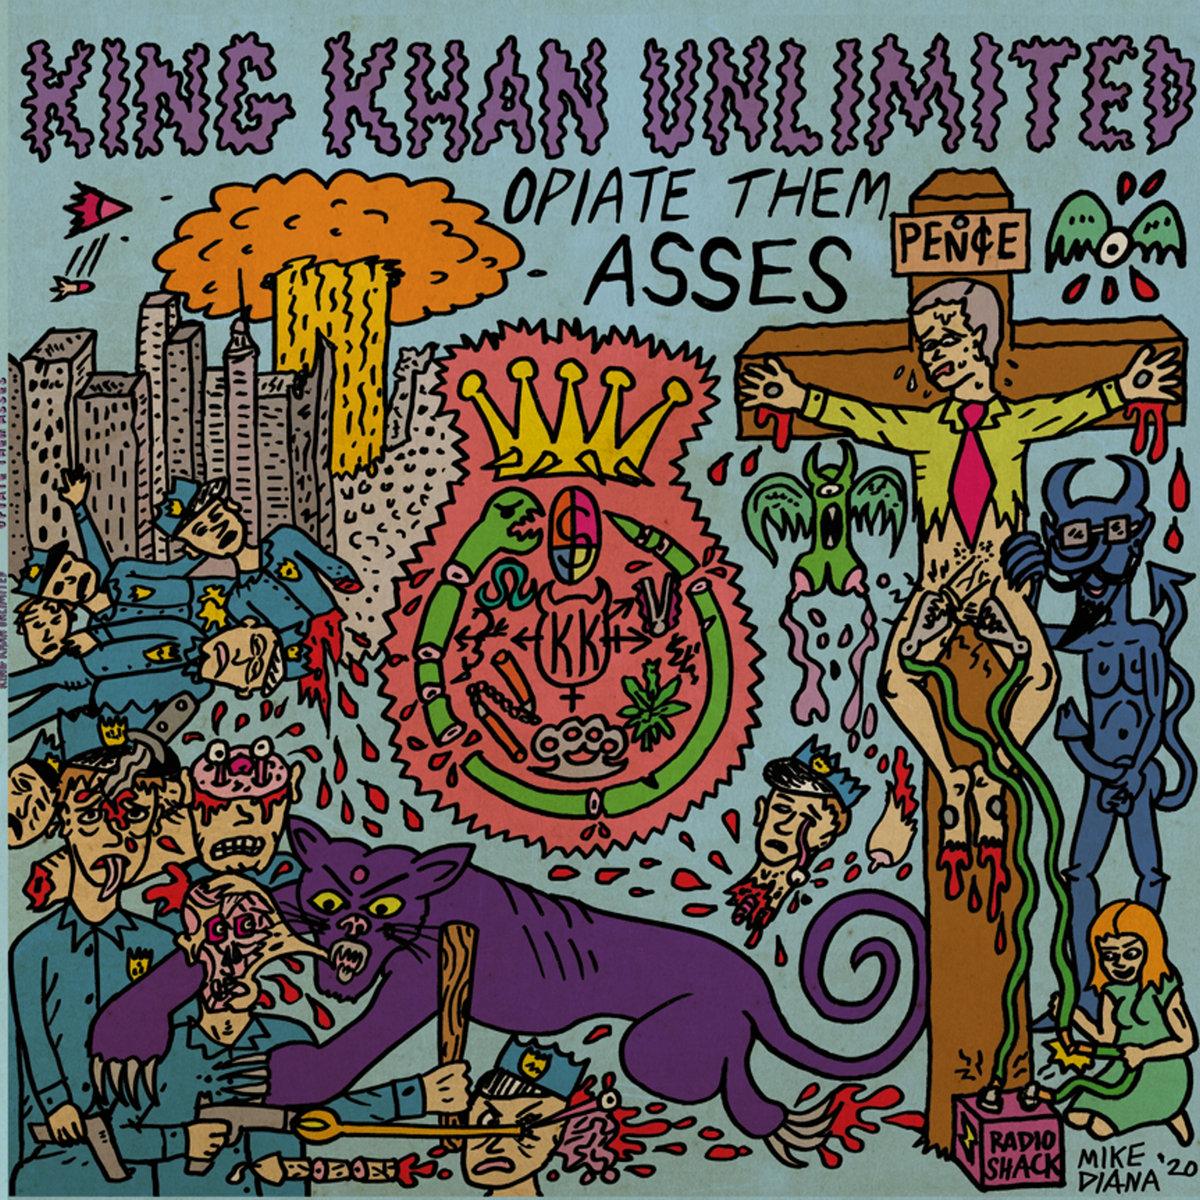 King Khan Unlimited - Opiate Them Asses